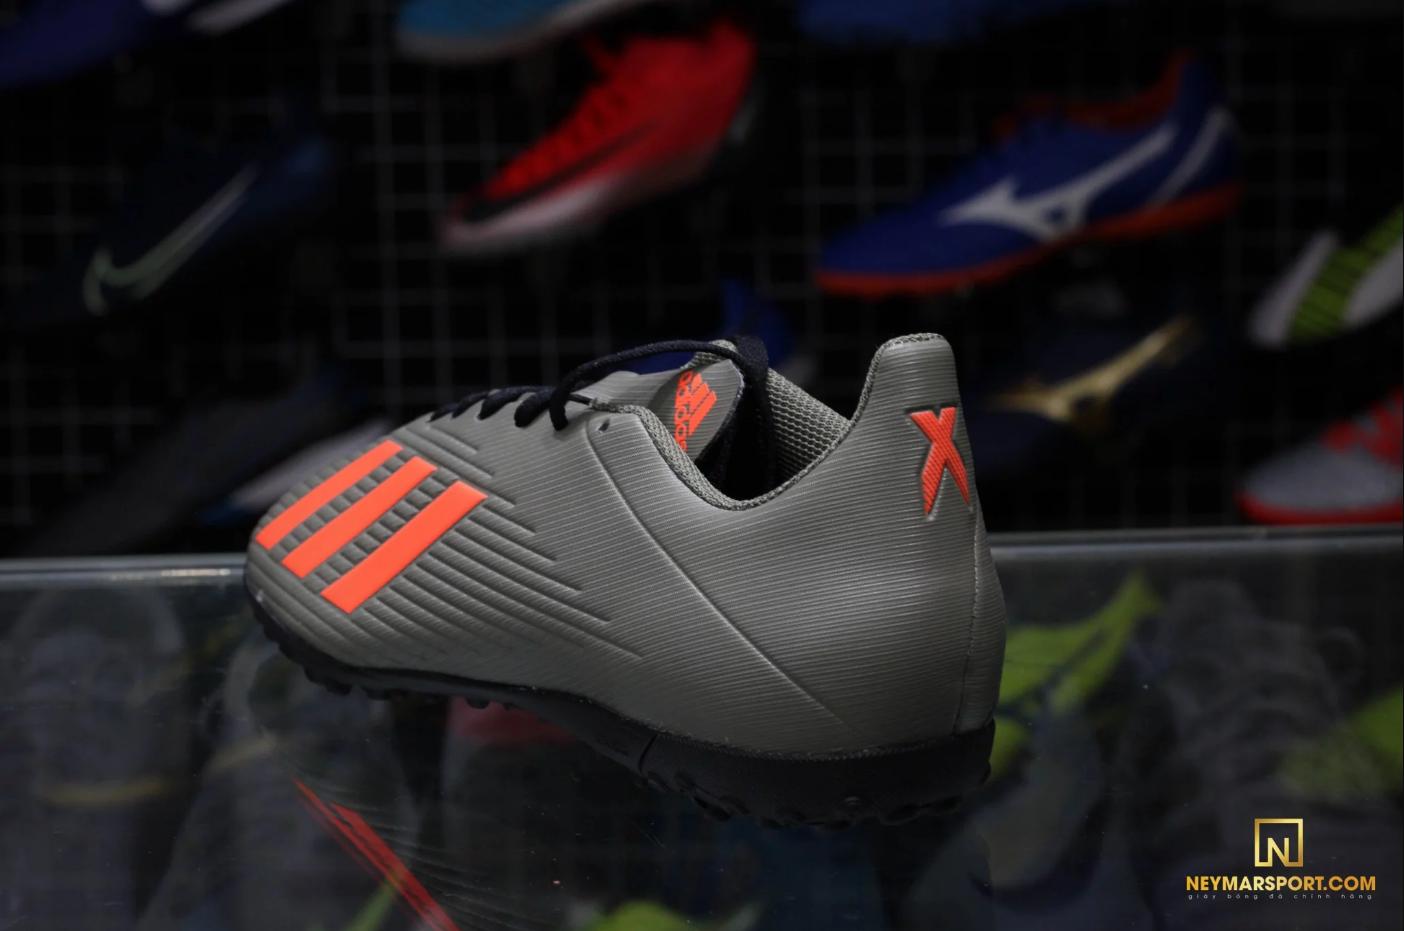 Adidas X 19.4 TF adidas X 19.4 TF